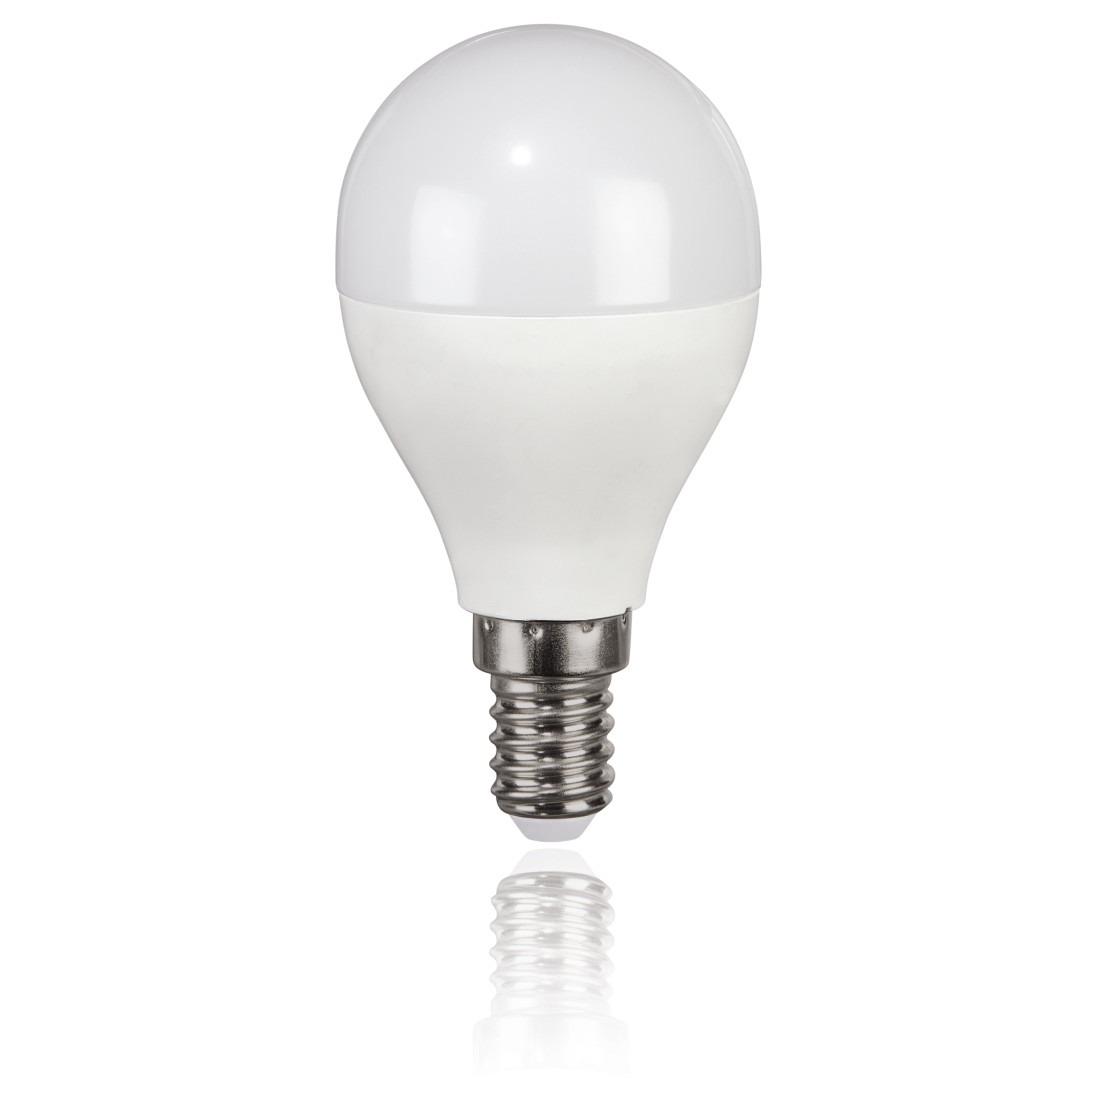 Korting Xavax LED lamp, E14, 530lm vervangt 43Watt, daglicht